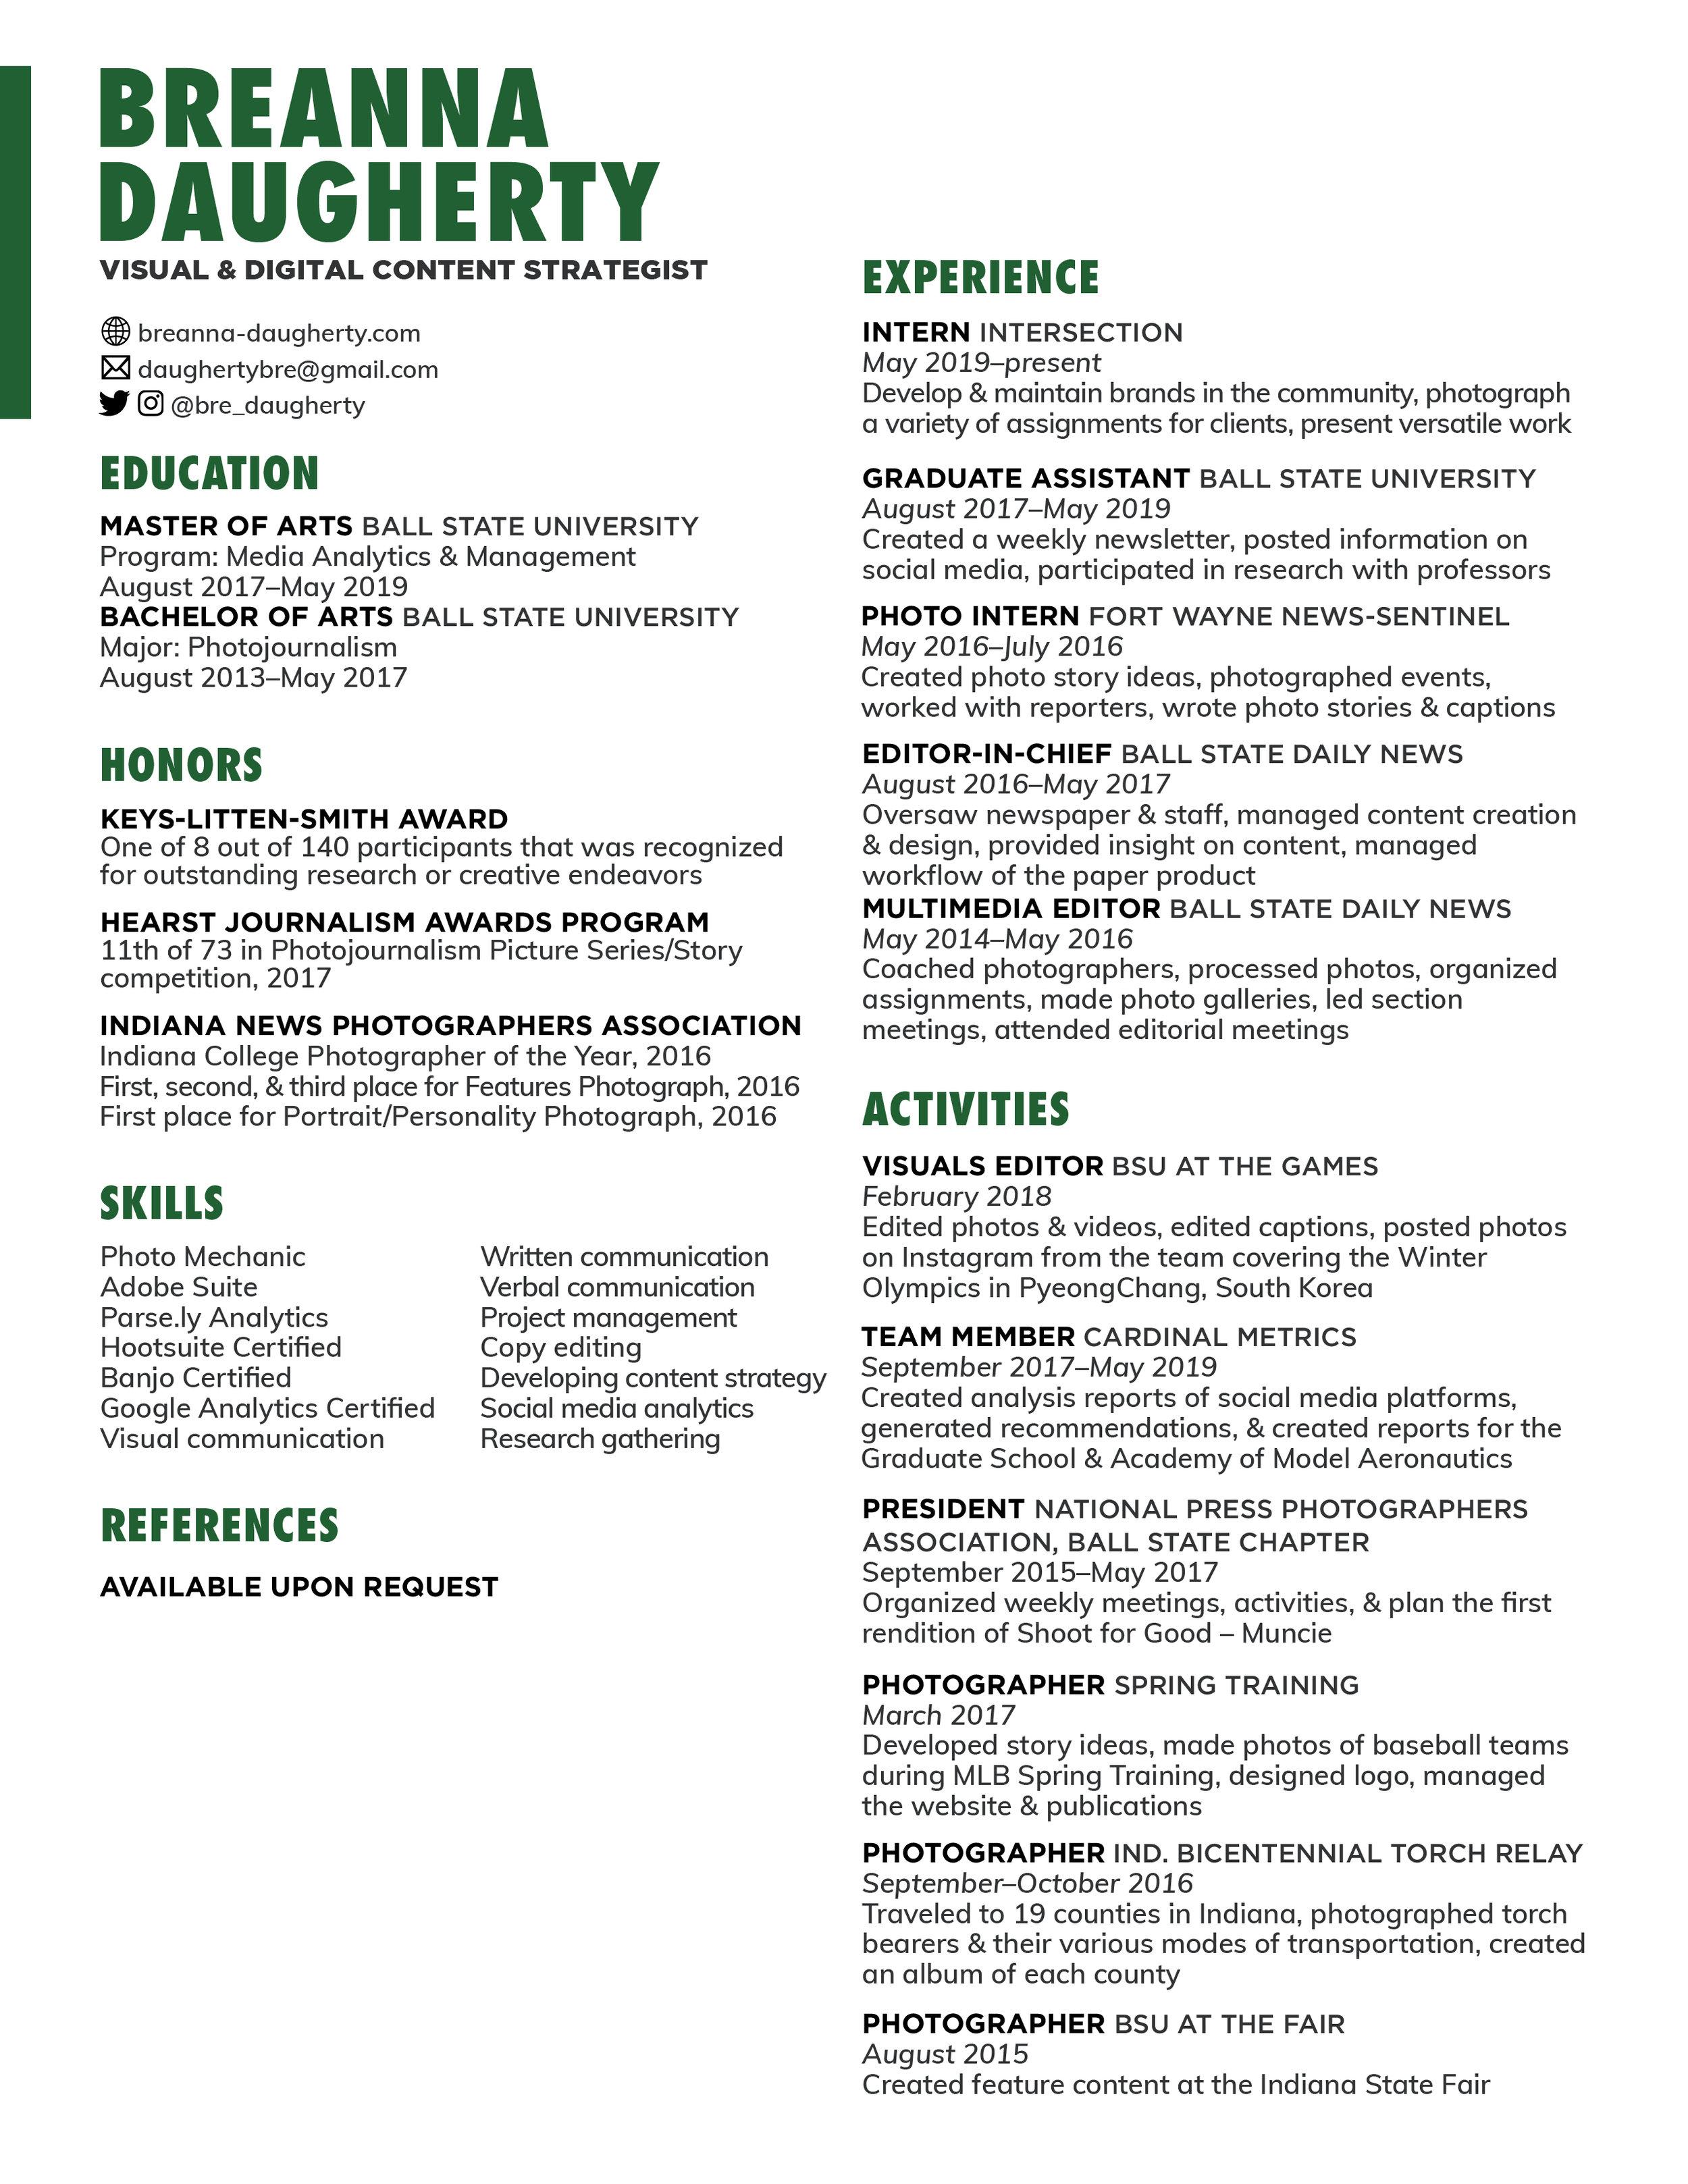 Daugherty_Resume_May2019_web.jpg